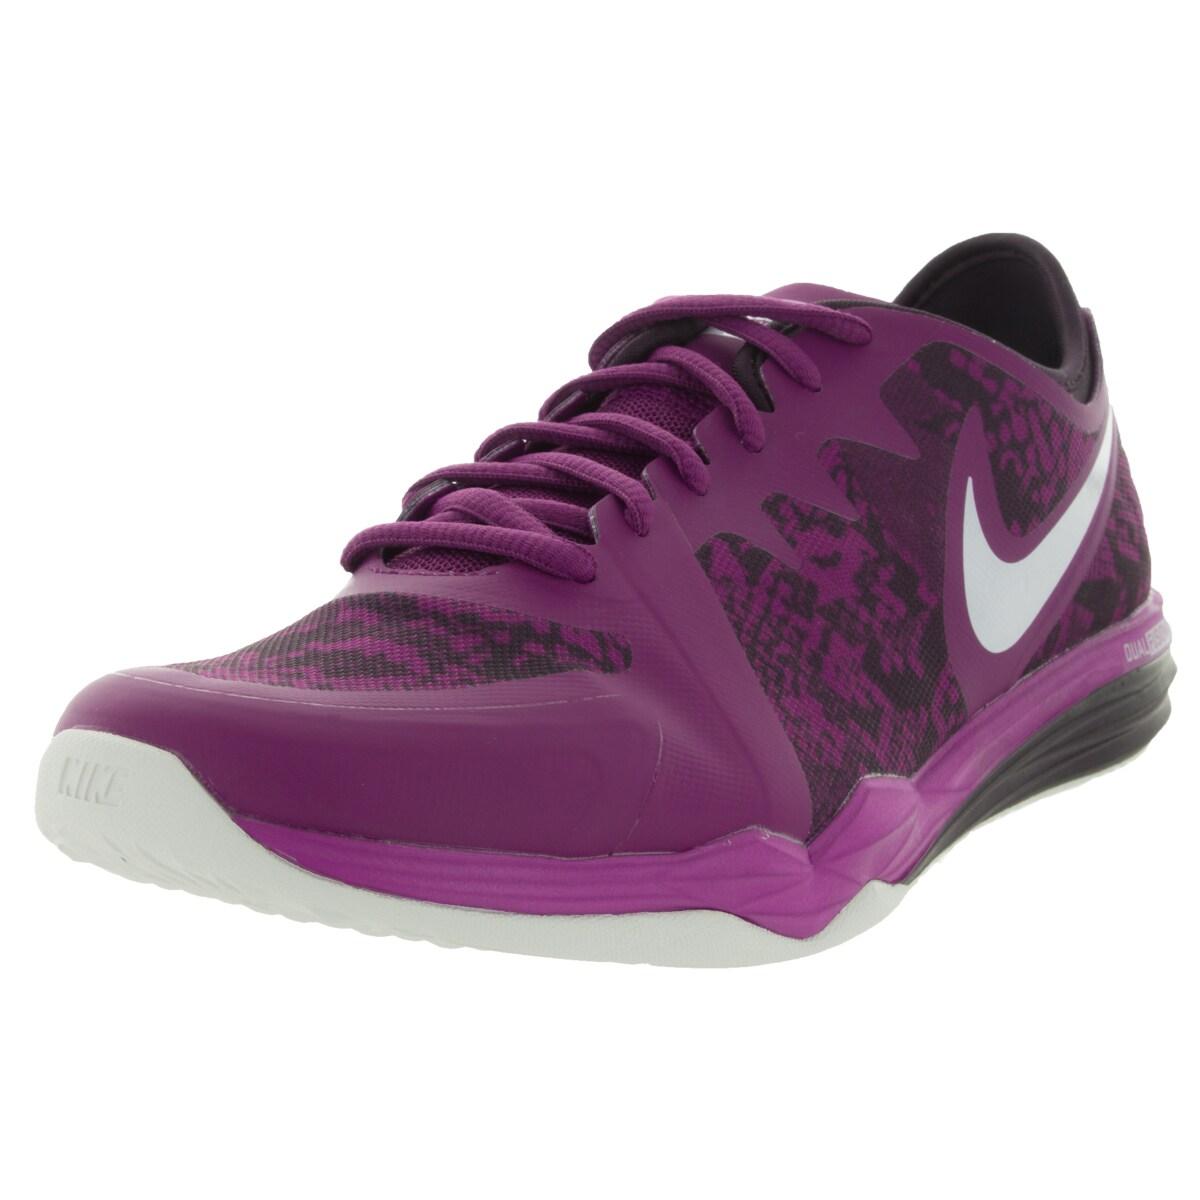 Nike Women's Dual Fusion Tr 3 Print Purple Dusk/White/Nob...